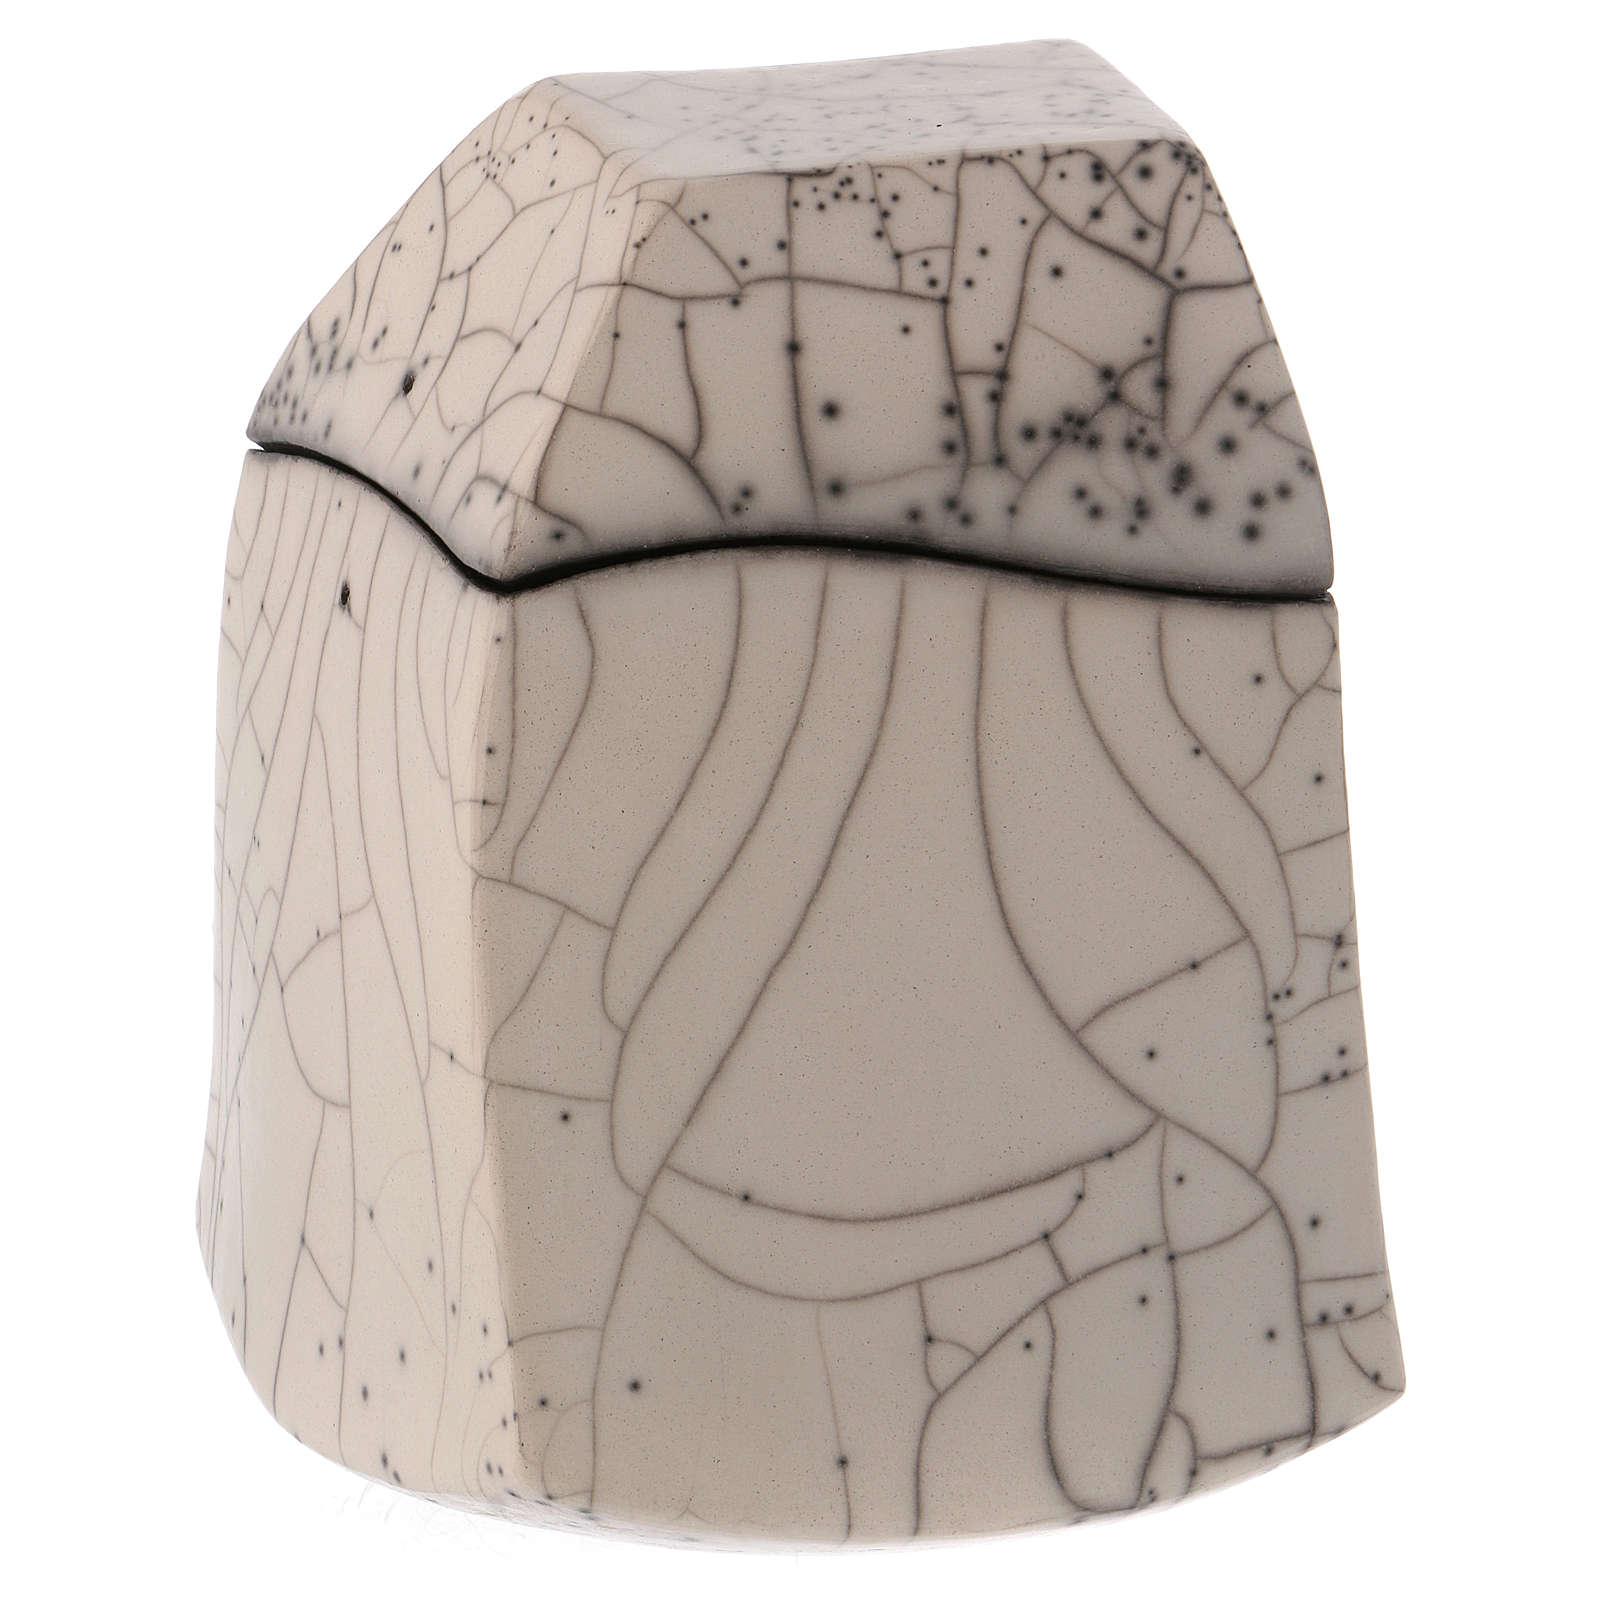 Cinerary urn, Naked Raku, Square 1/10 3